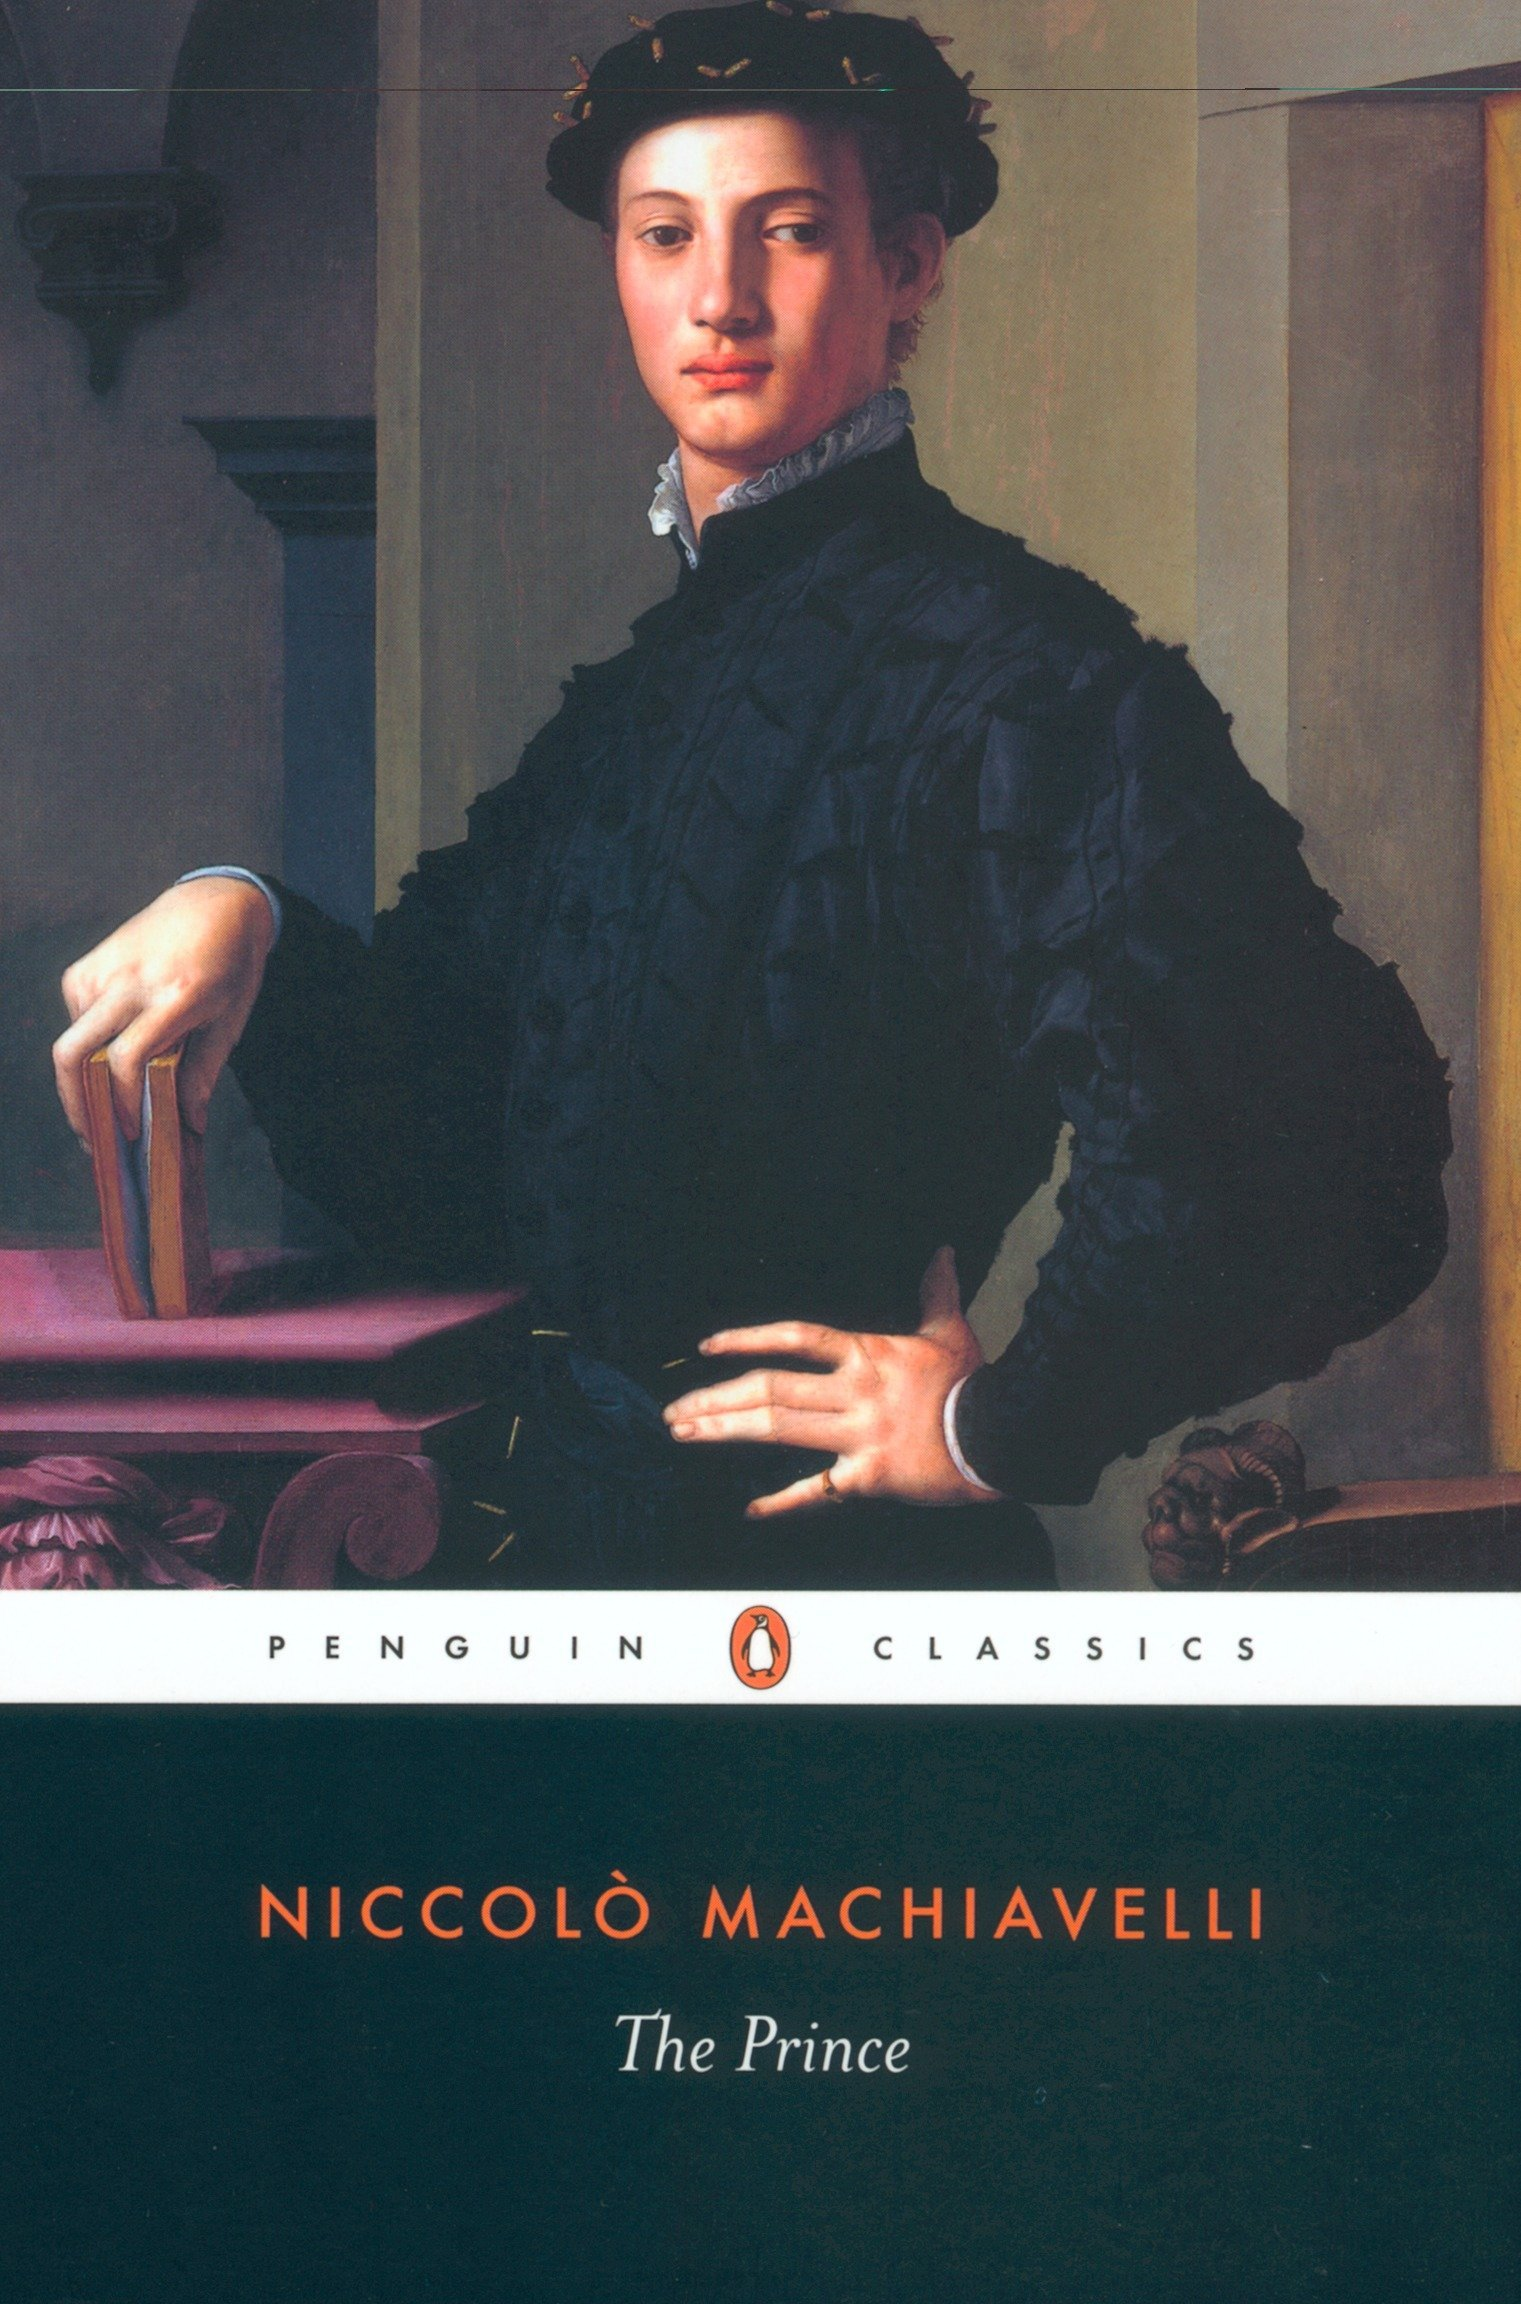 machiavelli książe (penguin classics)